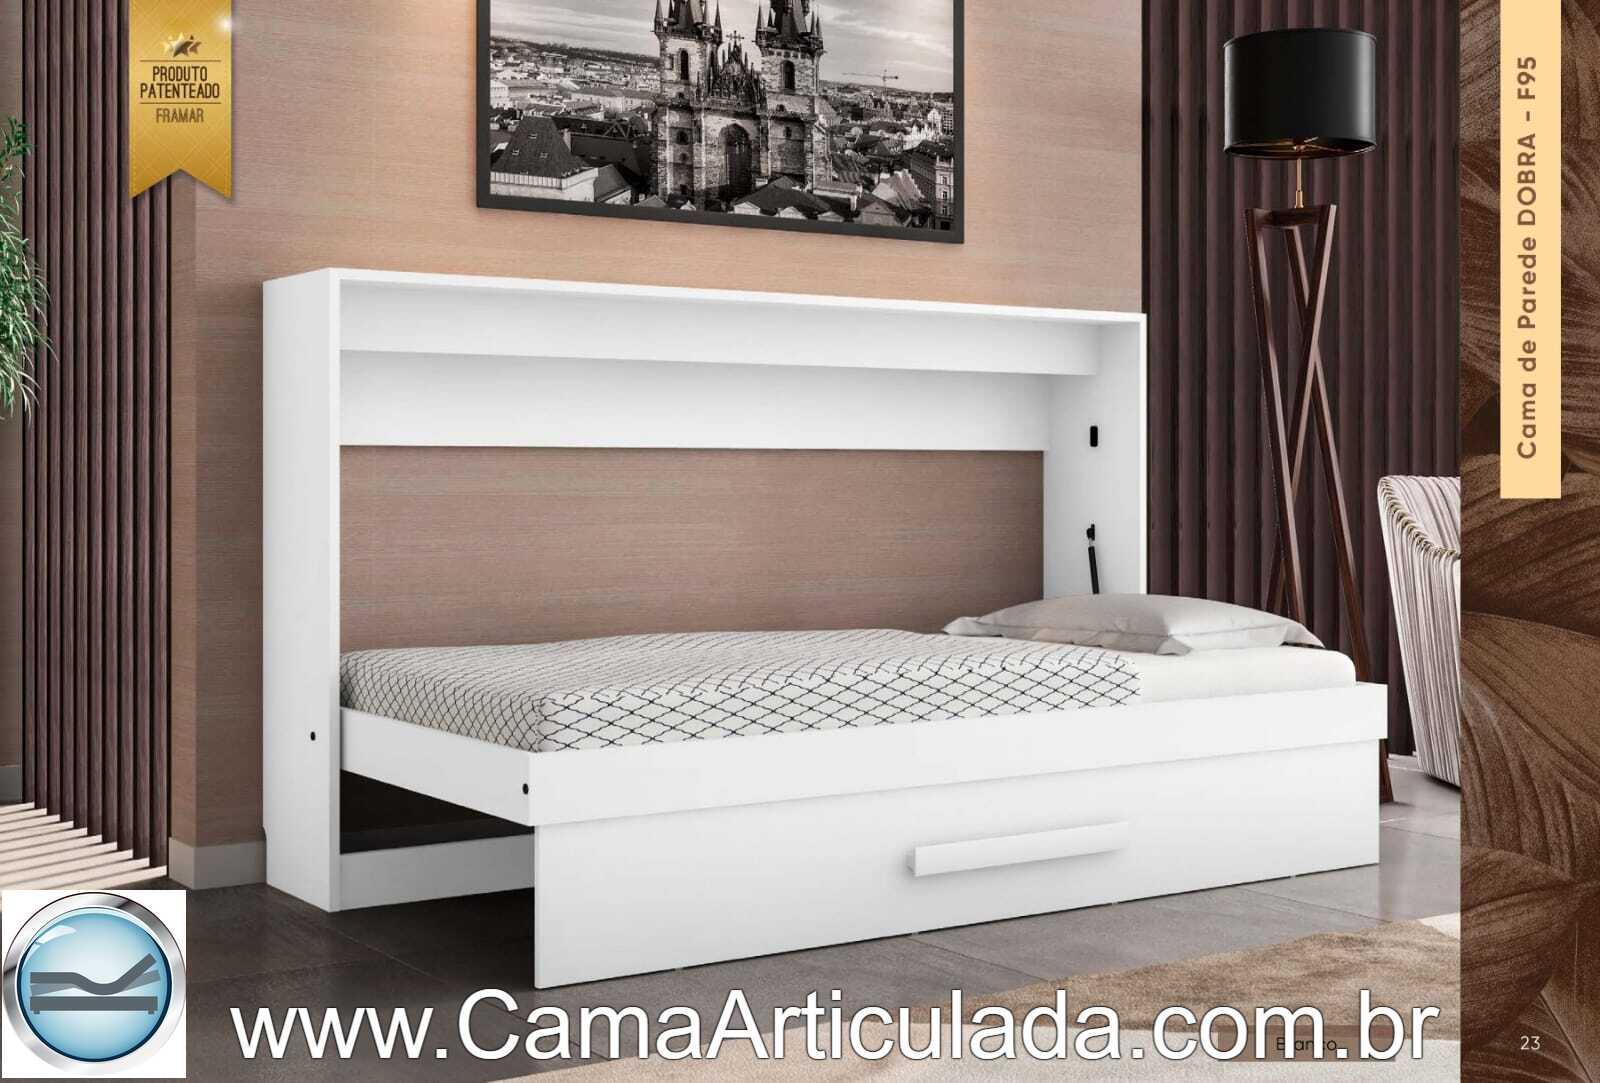 Cama Retrátil BASIC - Embutida Solteiro Horizontal SagaBrasil